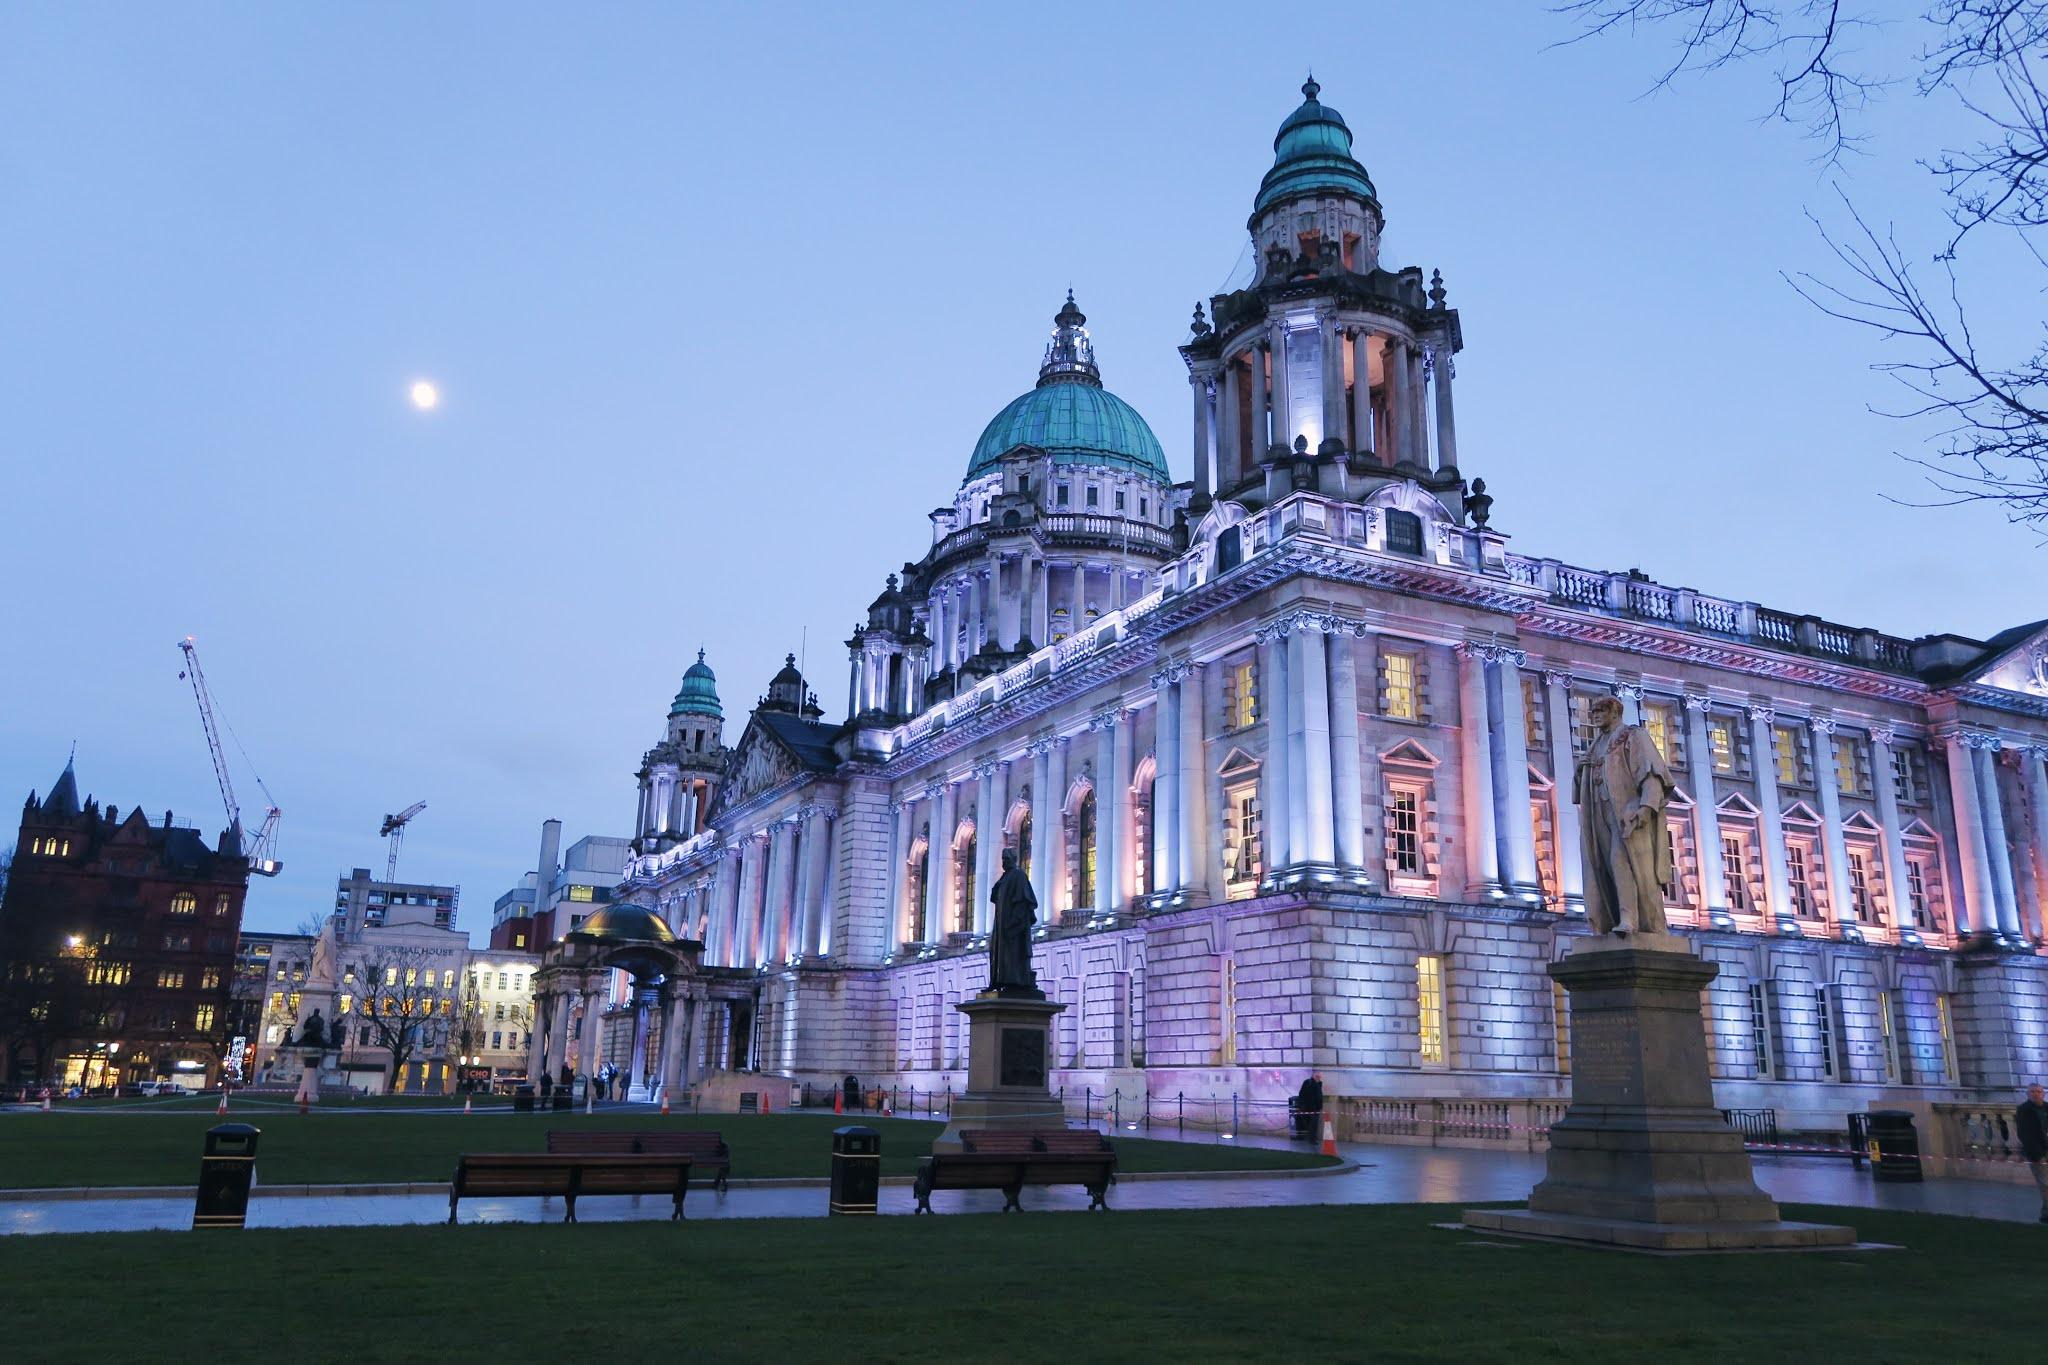 Belfast City Hall lit up by purple light at night